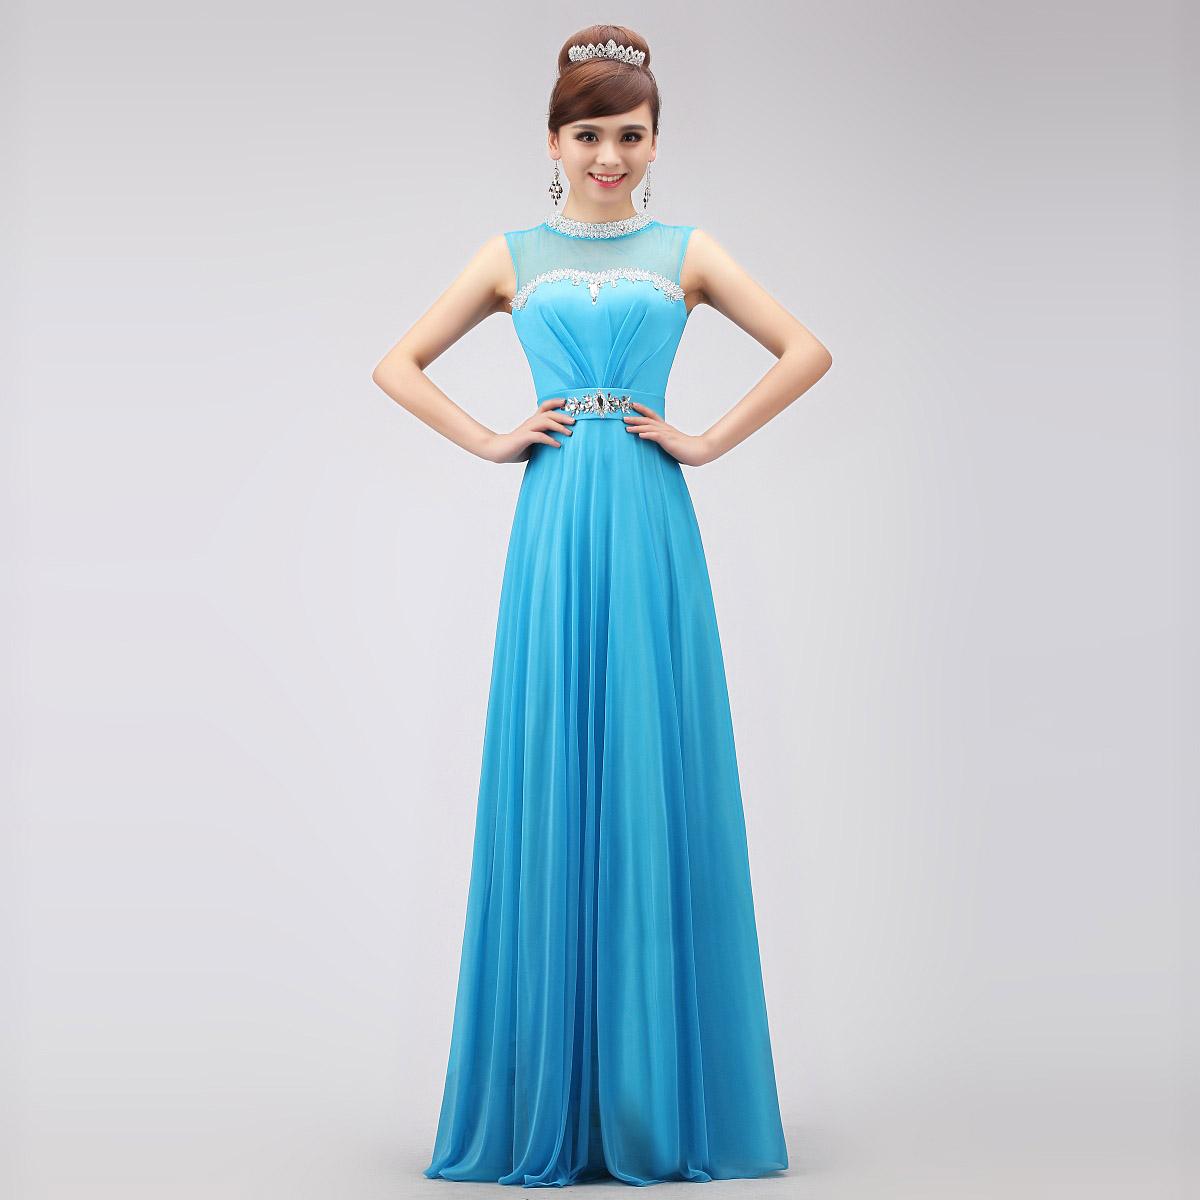 Pretty Modest Cocktail Dresses For Juniors Photos - Wedding Ideas ...